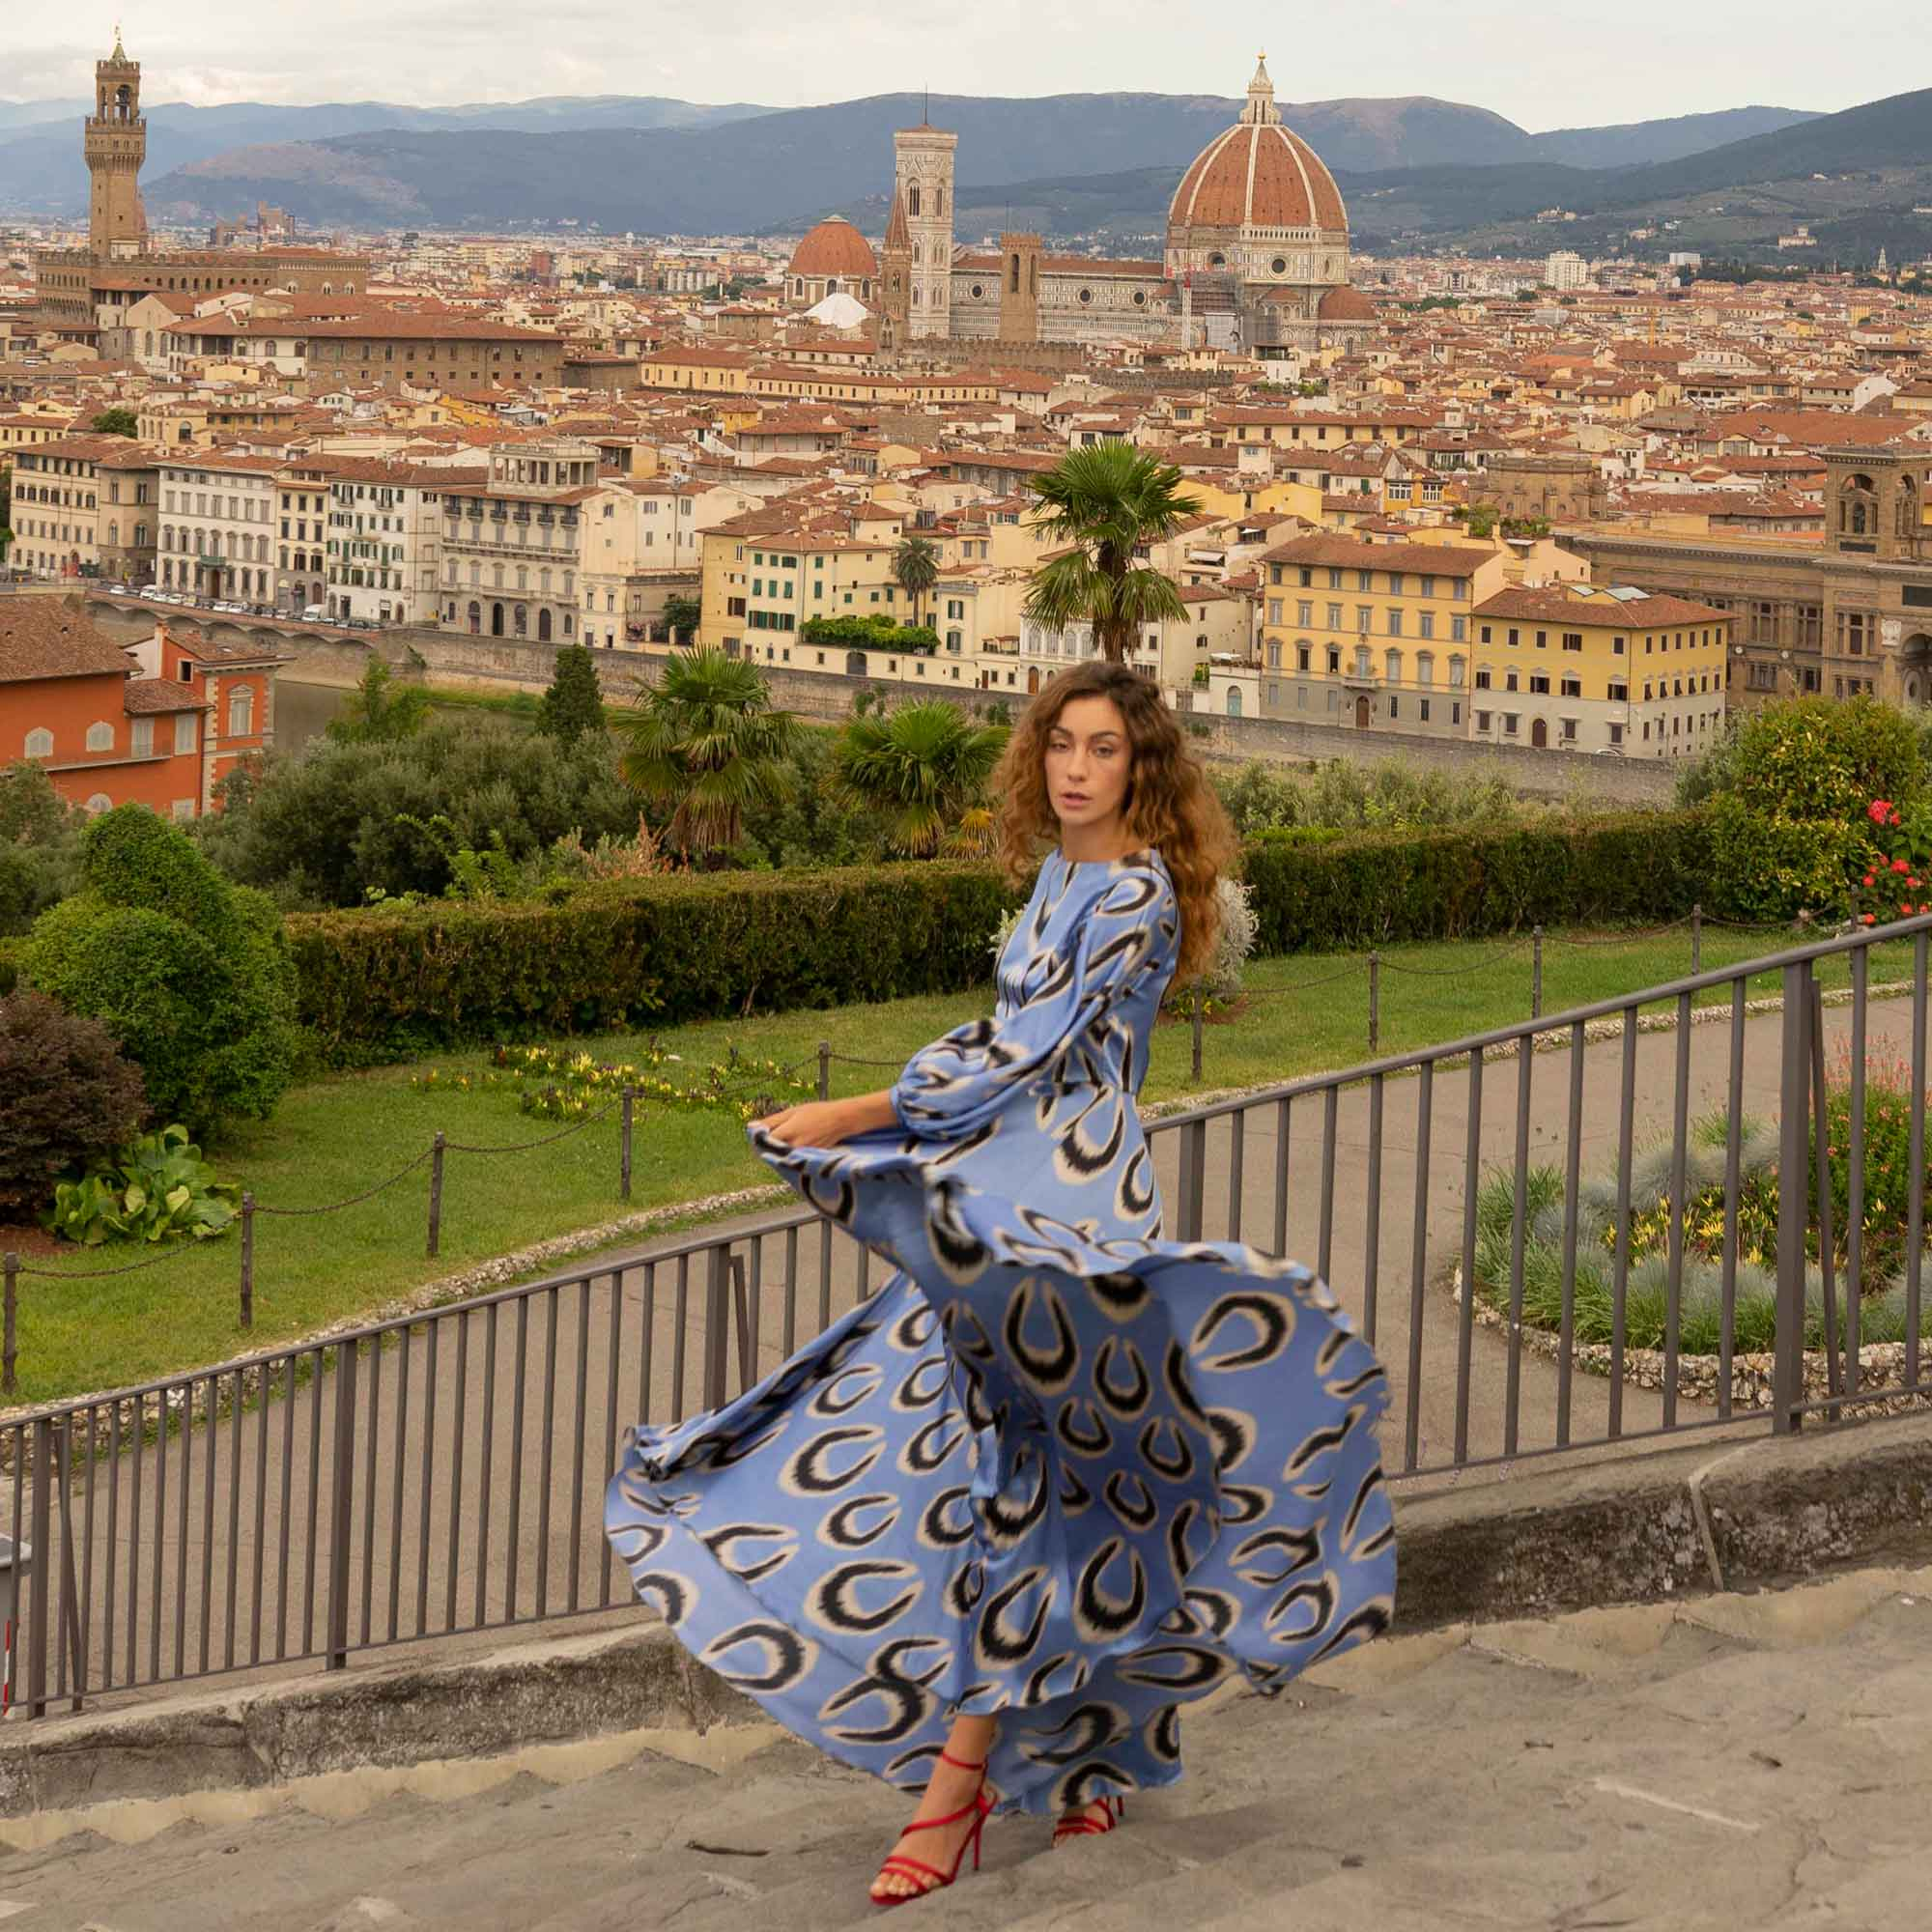 BLOG LA DOLCE VITA BELLE IKAT DRESS FLORENCE ECOLOOKBOOK